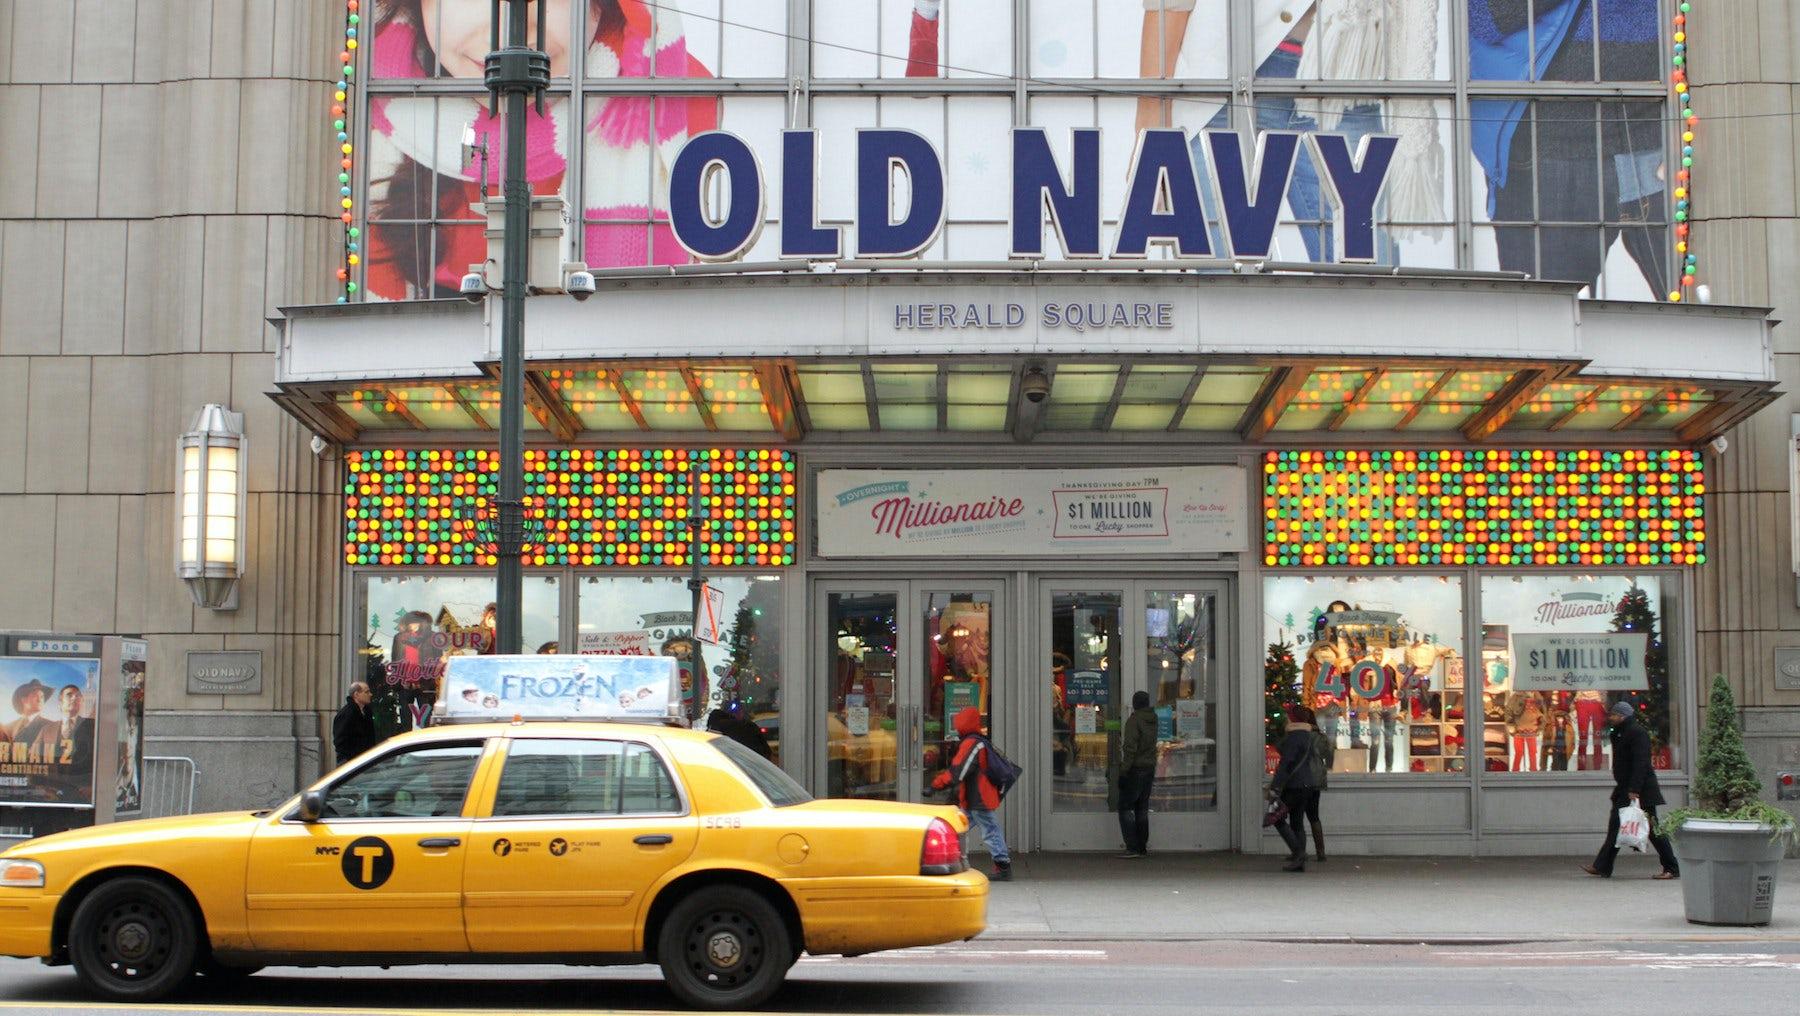 Gap Inc. Shifts Focus Towards Old Navy and Athleta